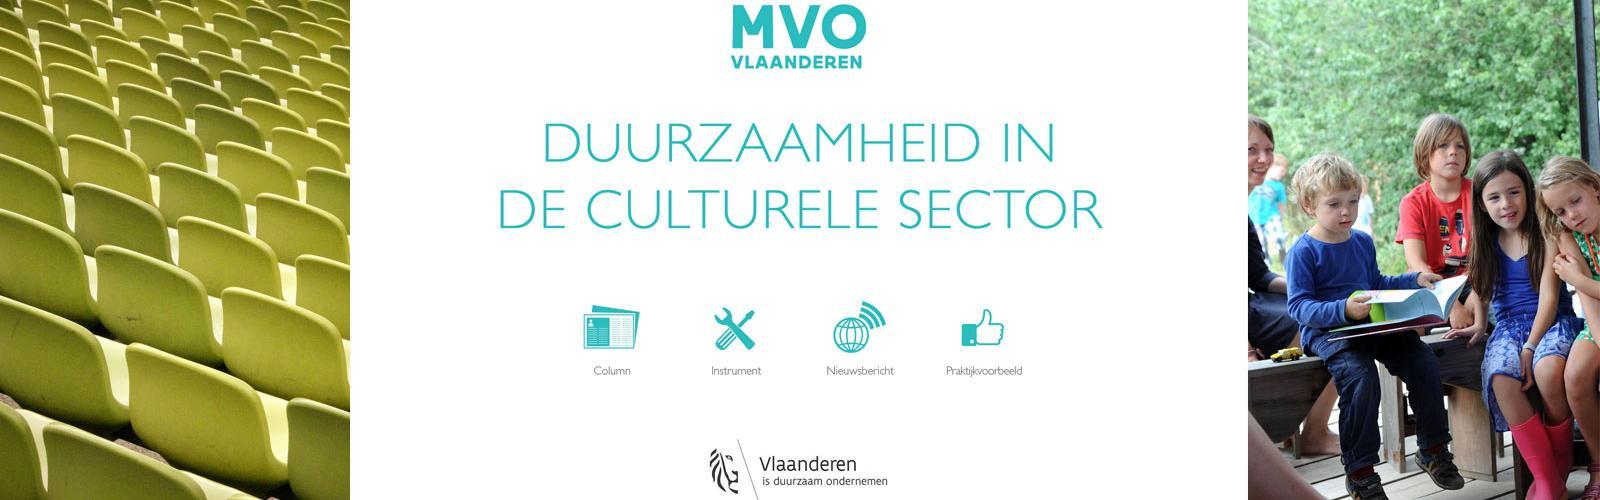 Coverbeeld themabundel cultuur